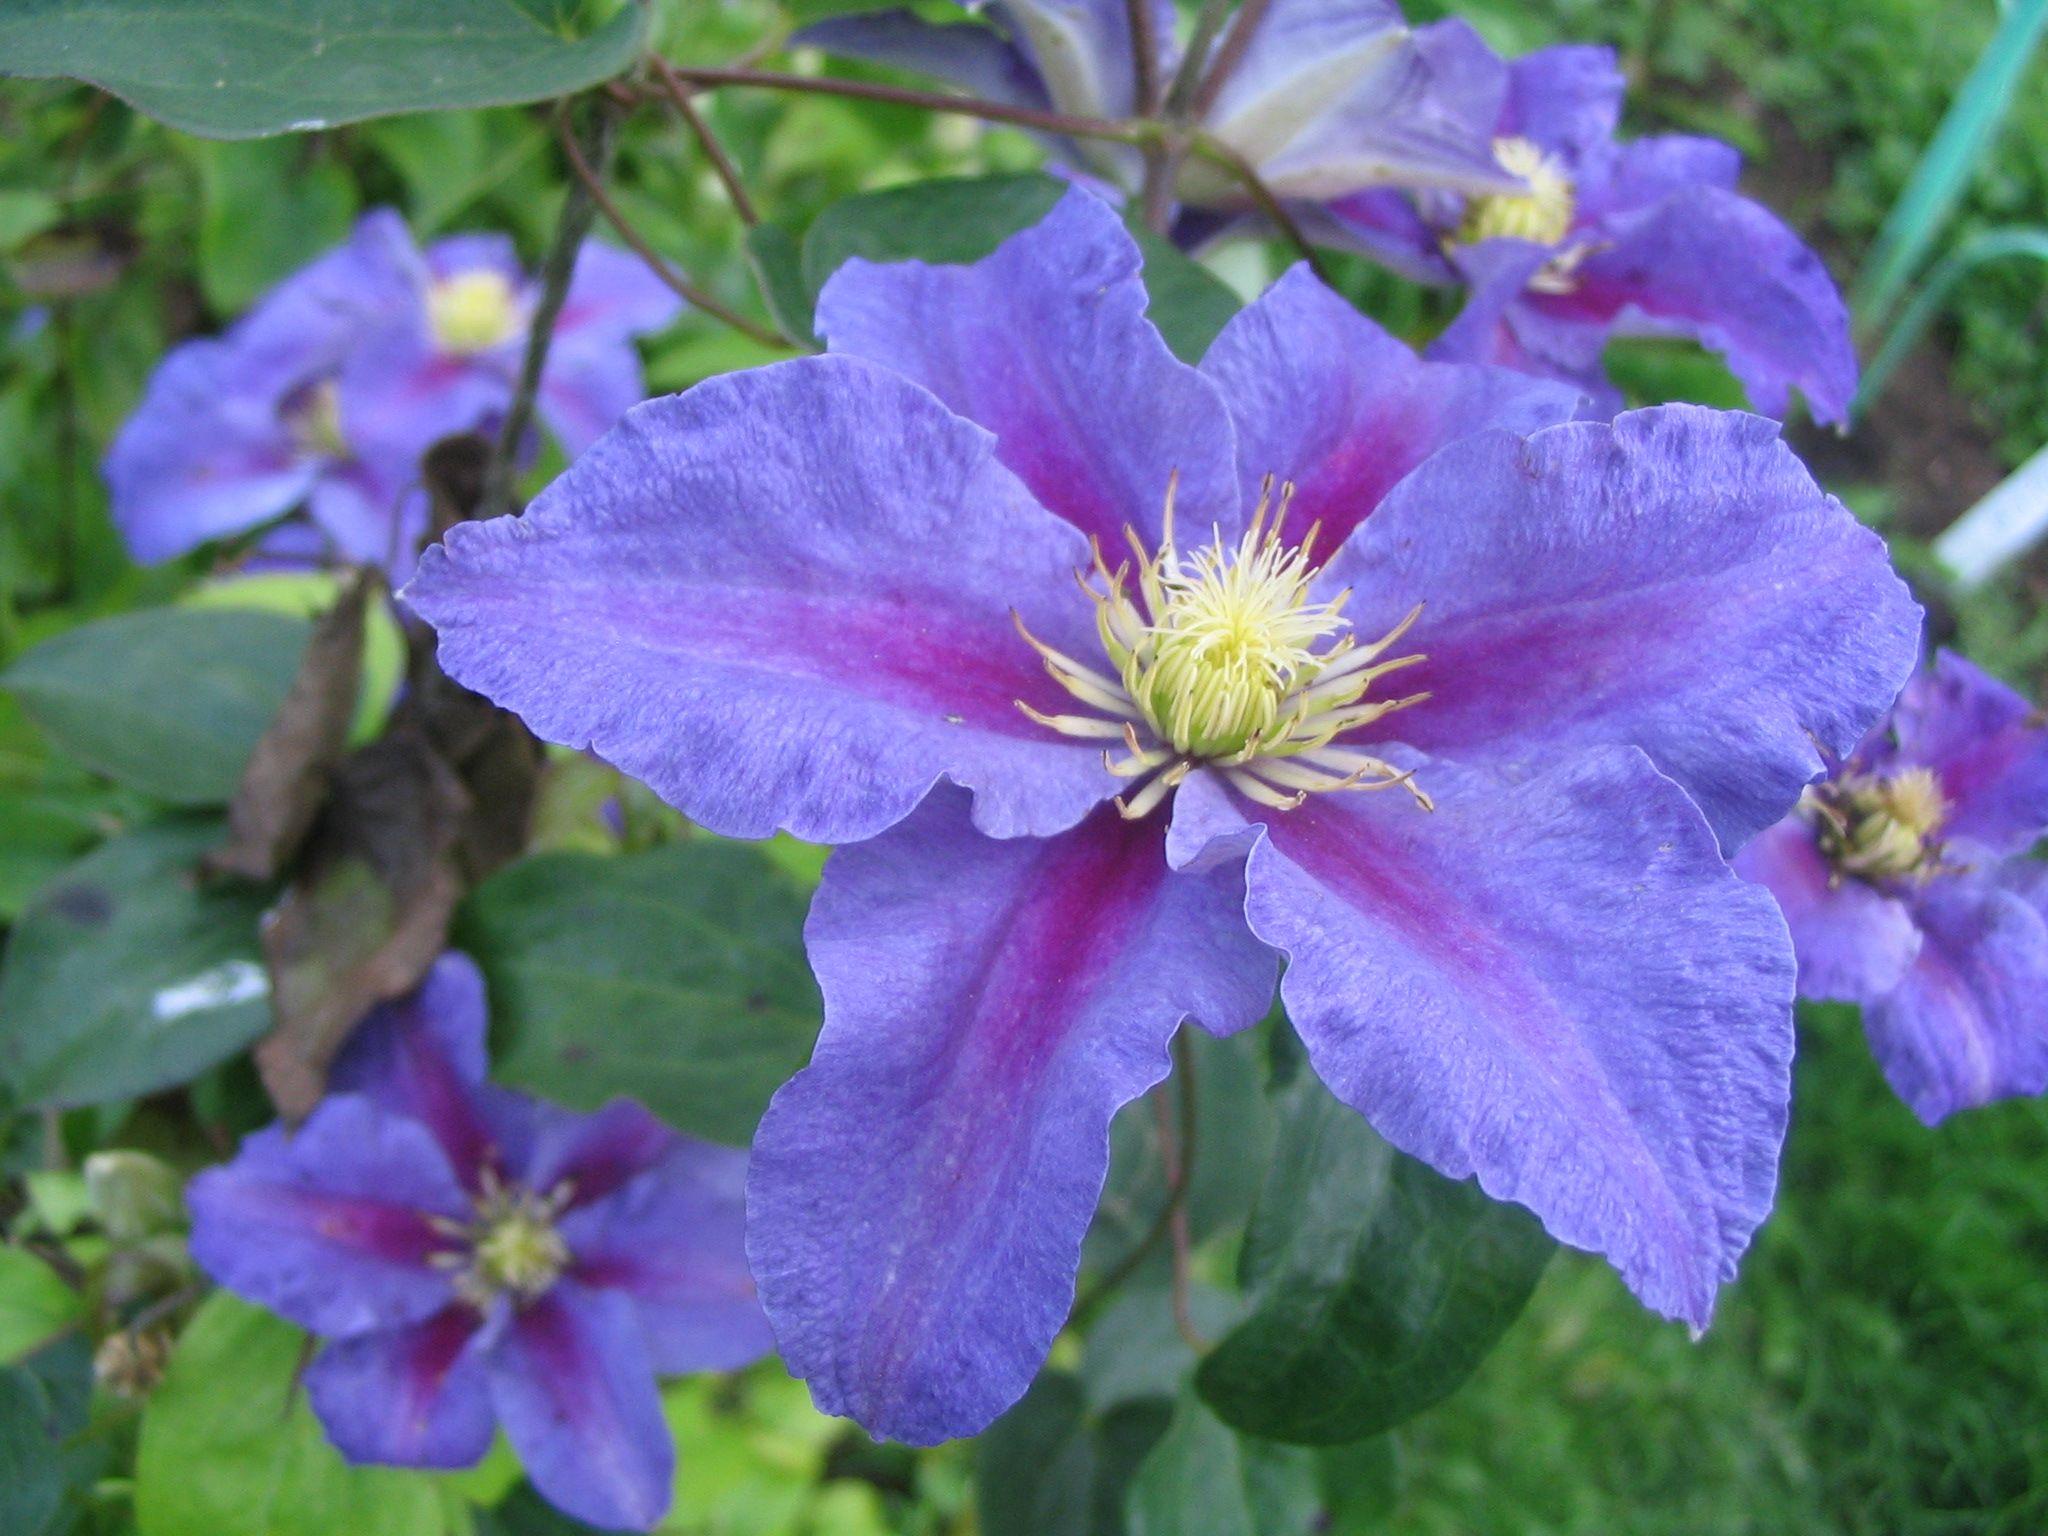 Ristimgi2g 20481536 pixels violets are blue pinterest jpg 20481536 pixels violets are blue pinterest clematis and fence izmirmasajfo